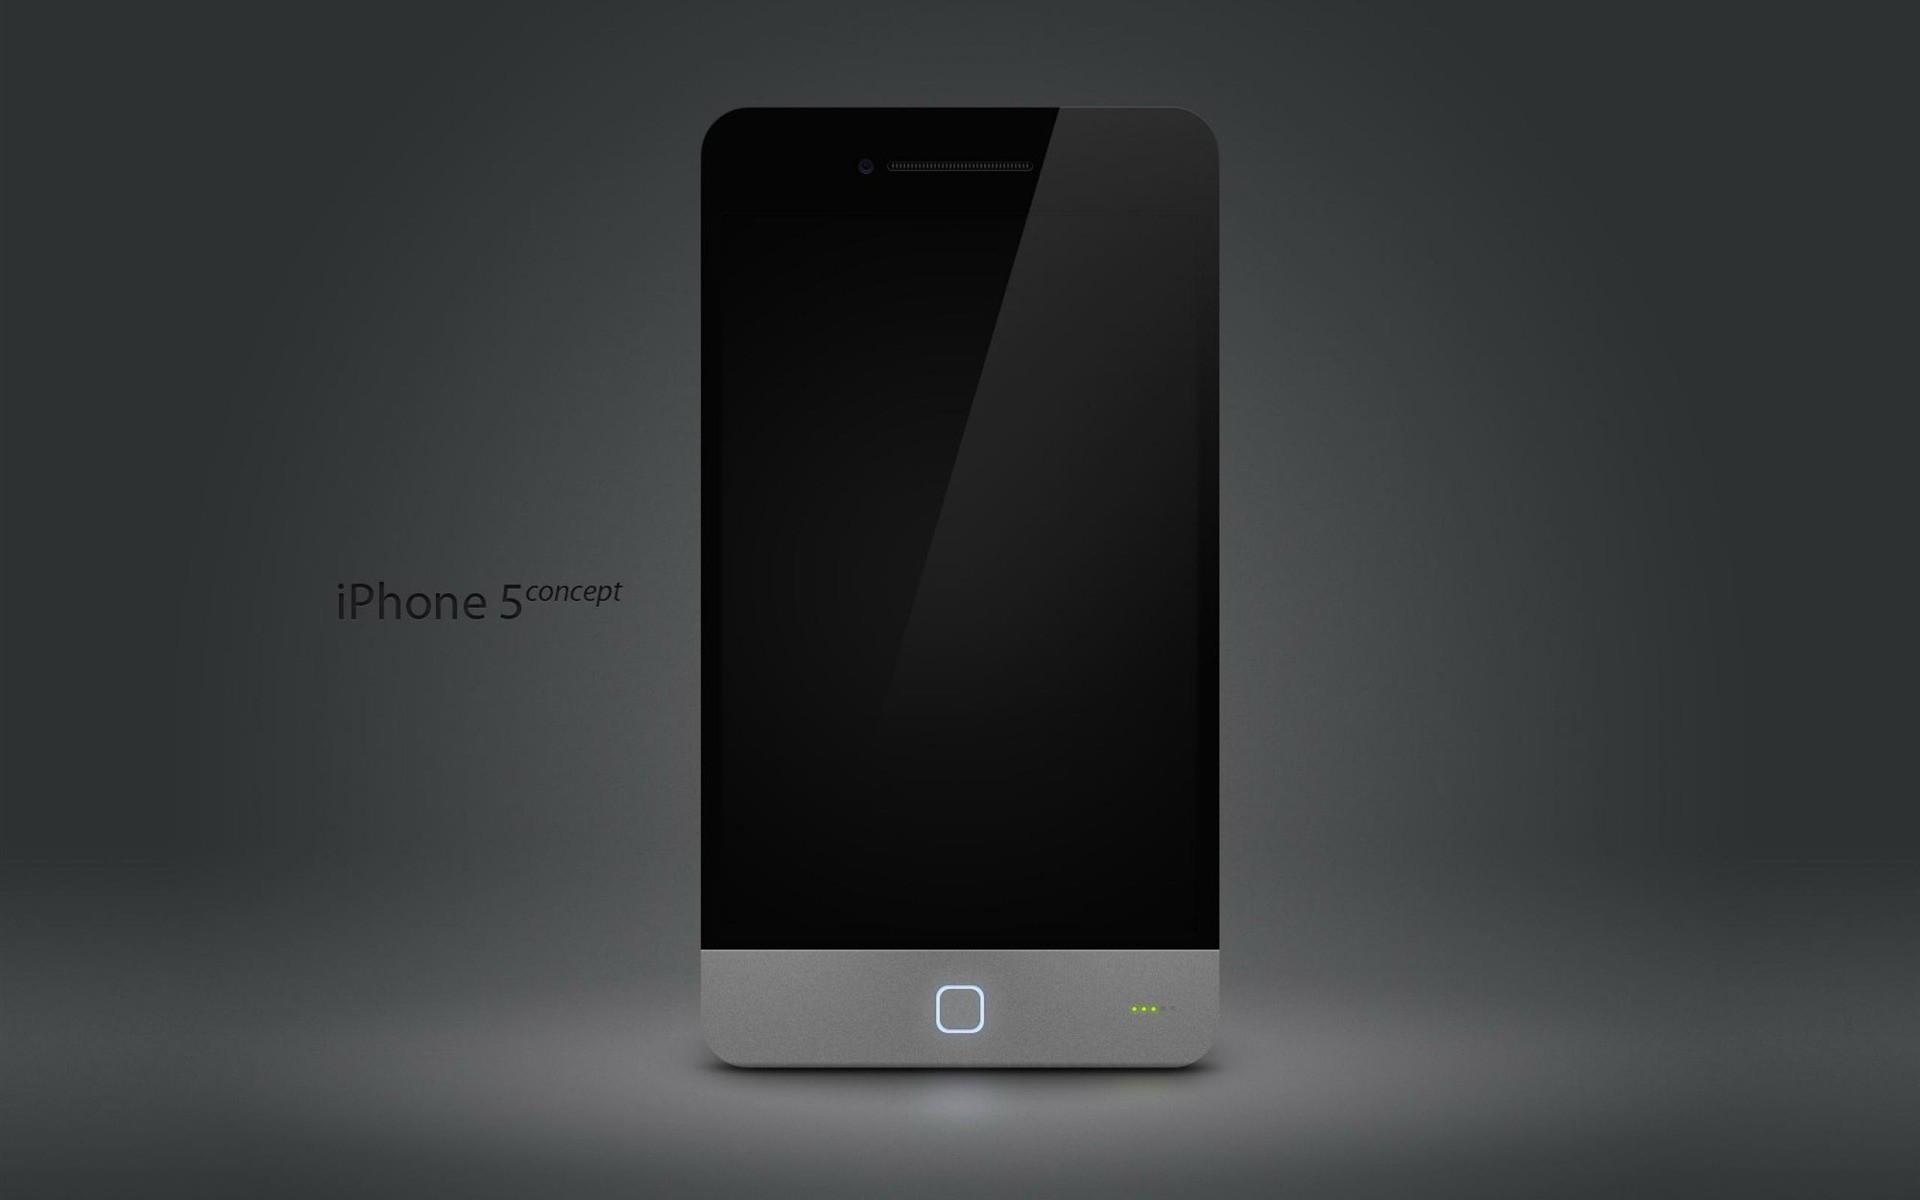 Iphone 5s Wallpaper Size No 1 Wallpaper Hd   Data Src - Iphone 5 Official Wallpapers Hd - HD Wallpaper